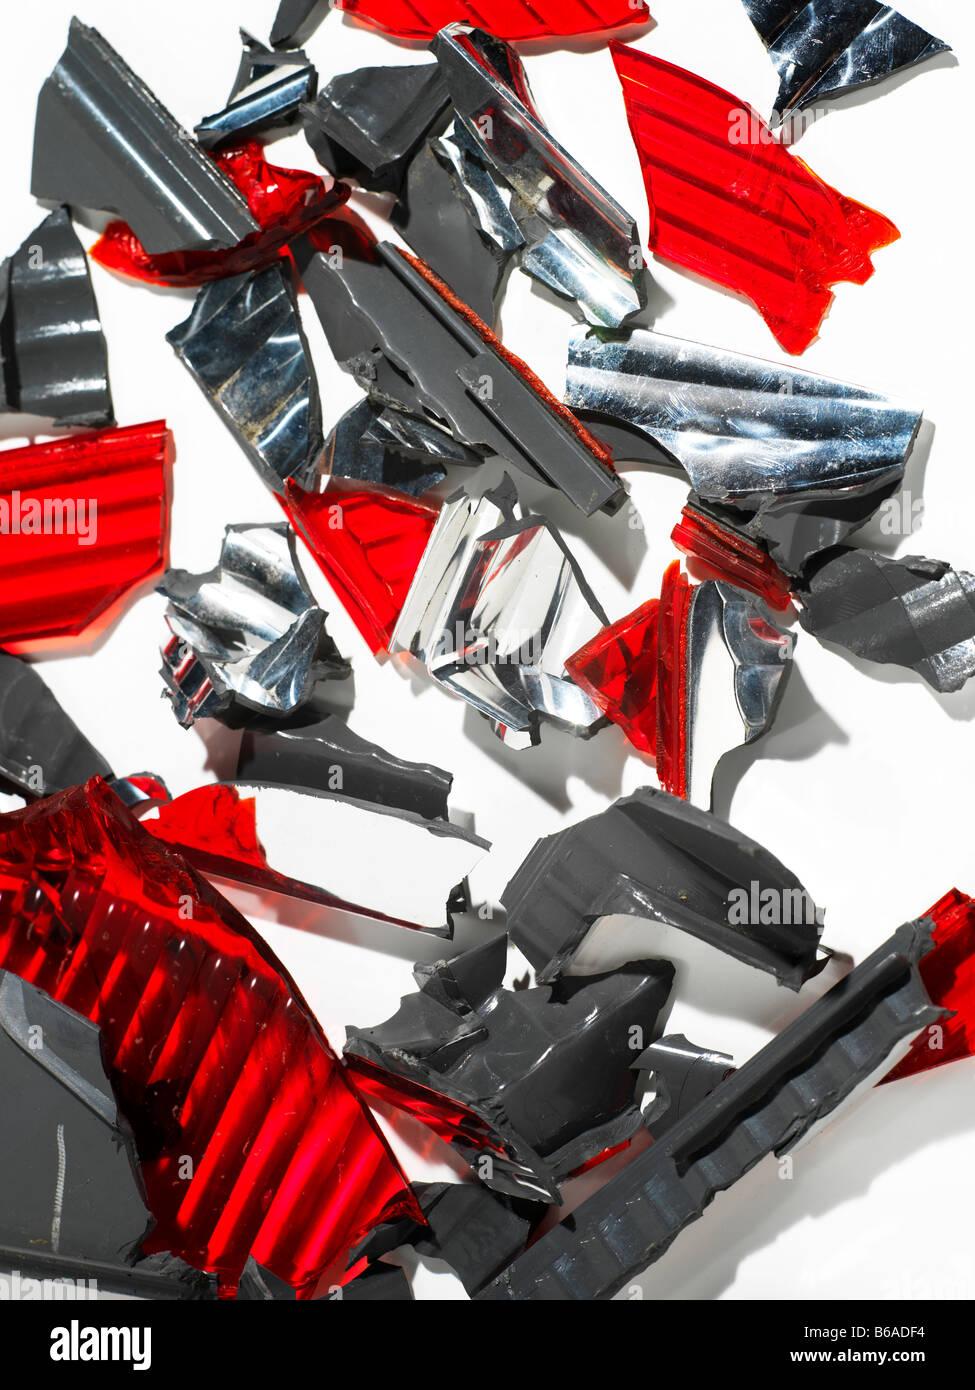 Autoteile Teile nach einem Unfall Kollision Stockbild